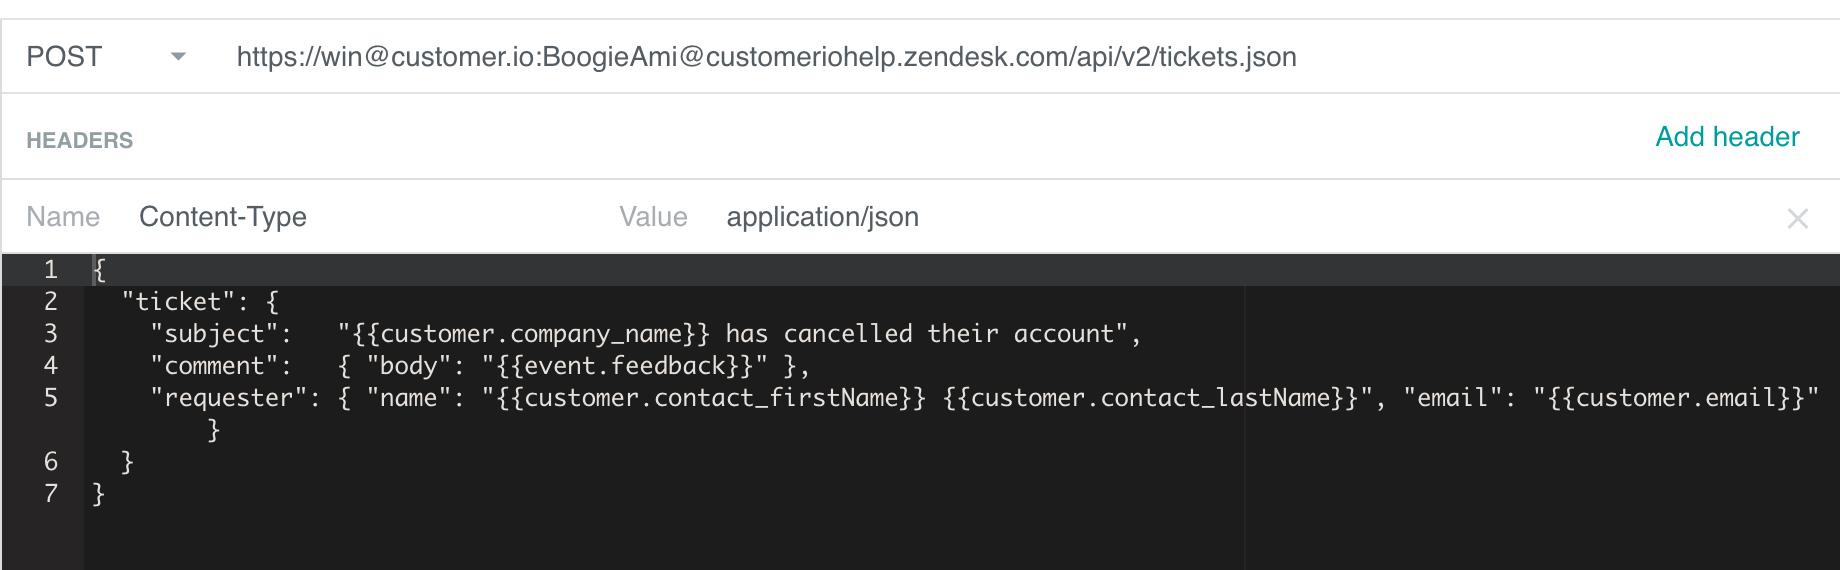 Create a Zendesk Ticket with Customer io - Customer io